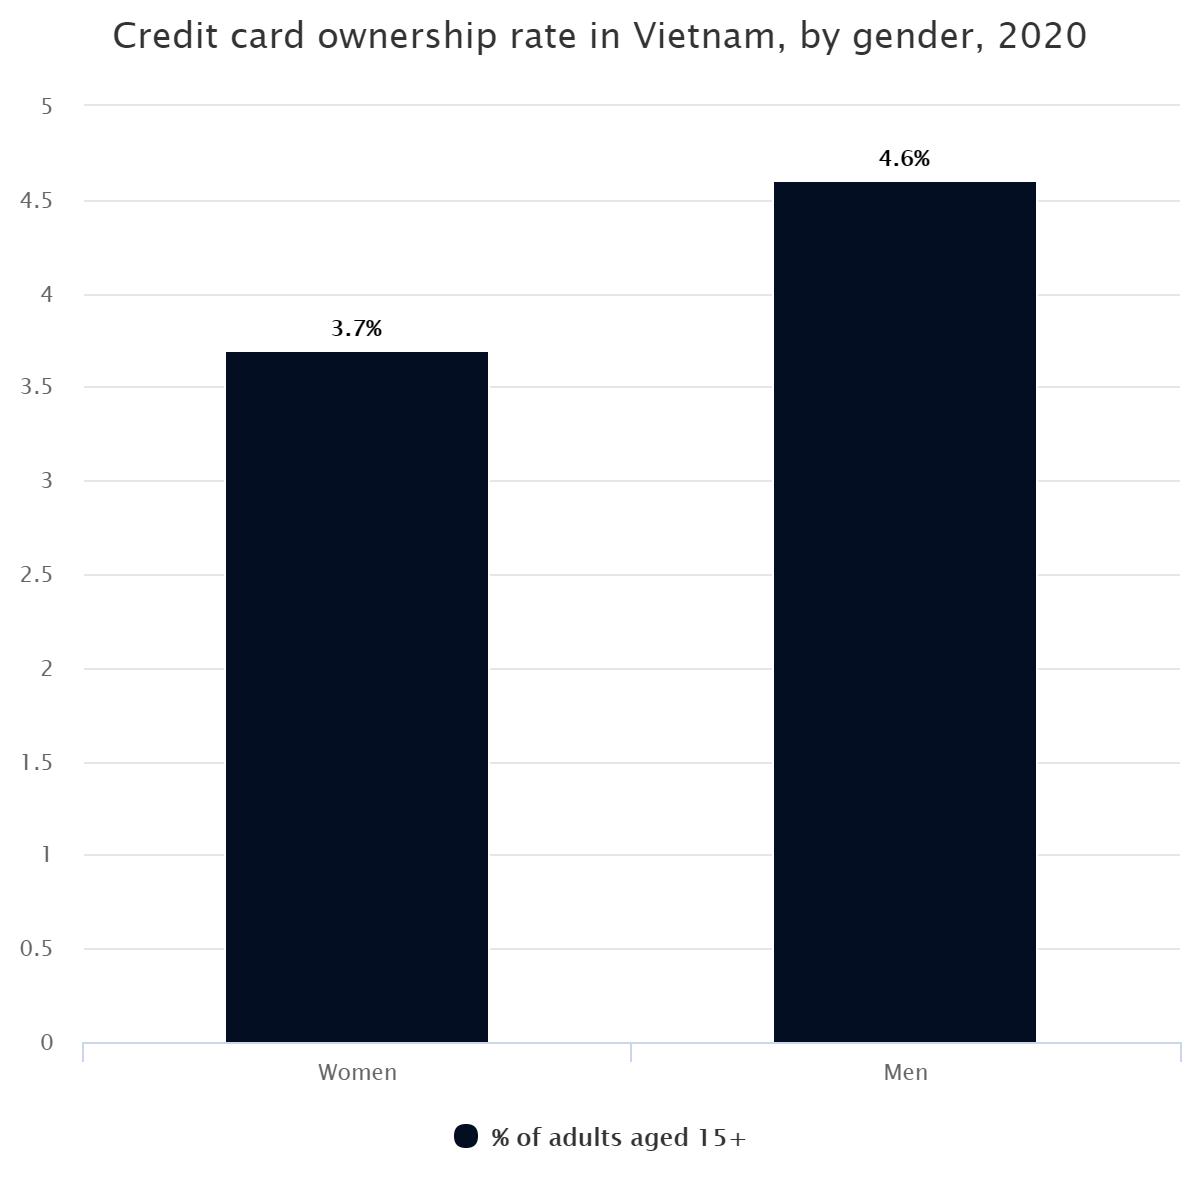 Credit card ownership rate in Vietnam, by gender, 2020